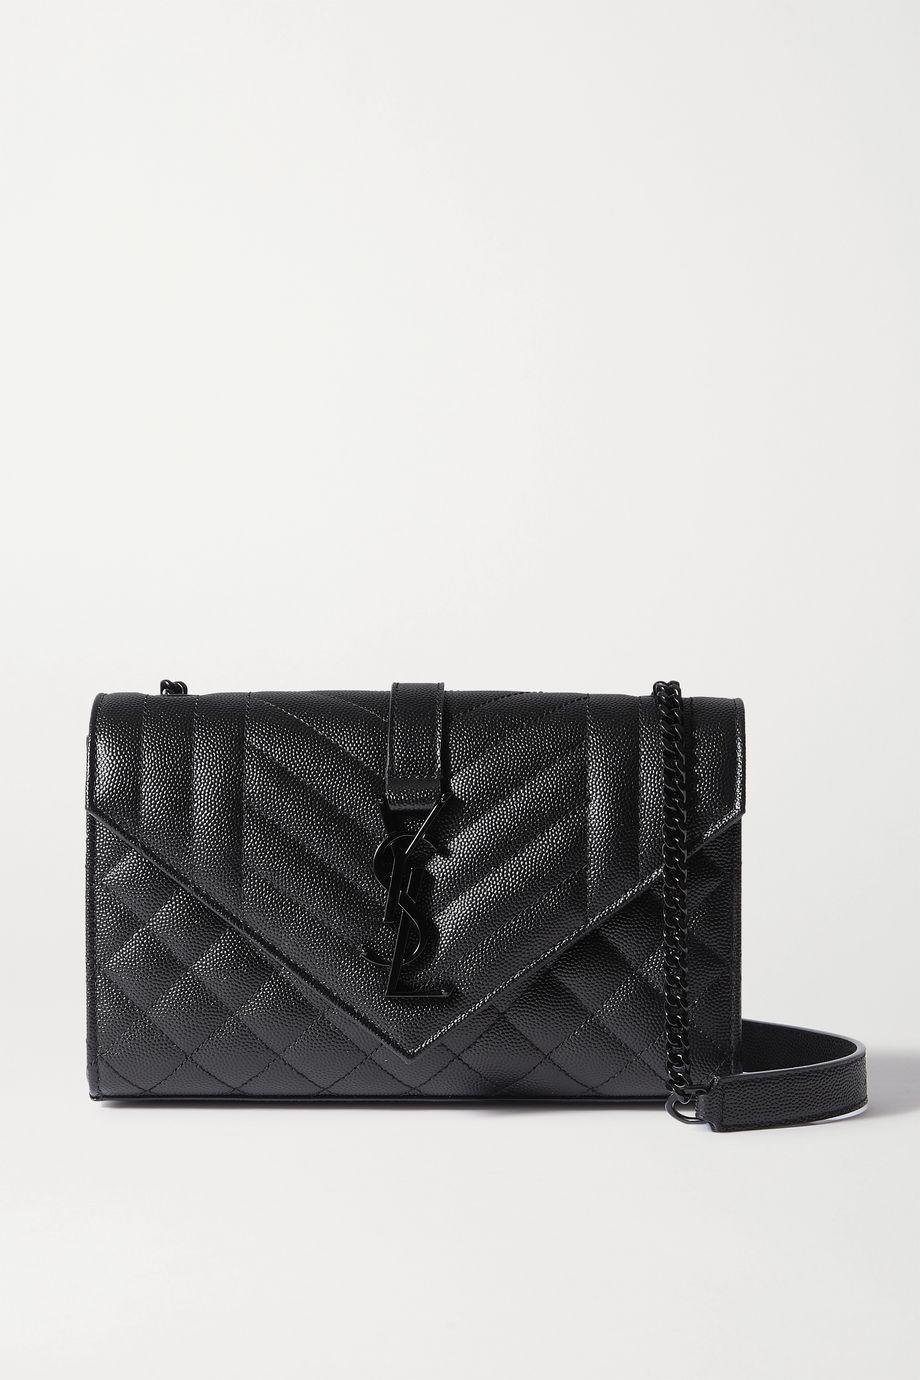 SAINT LAURENT Envelope small quilted textured-leather shoulder bag